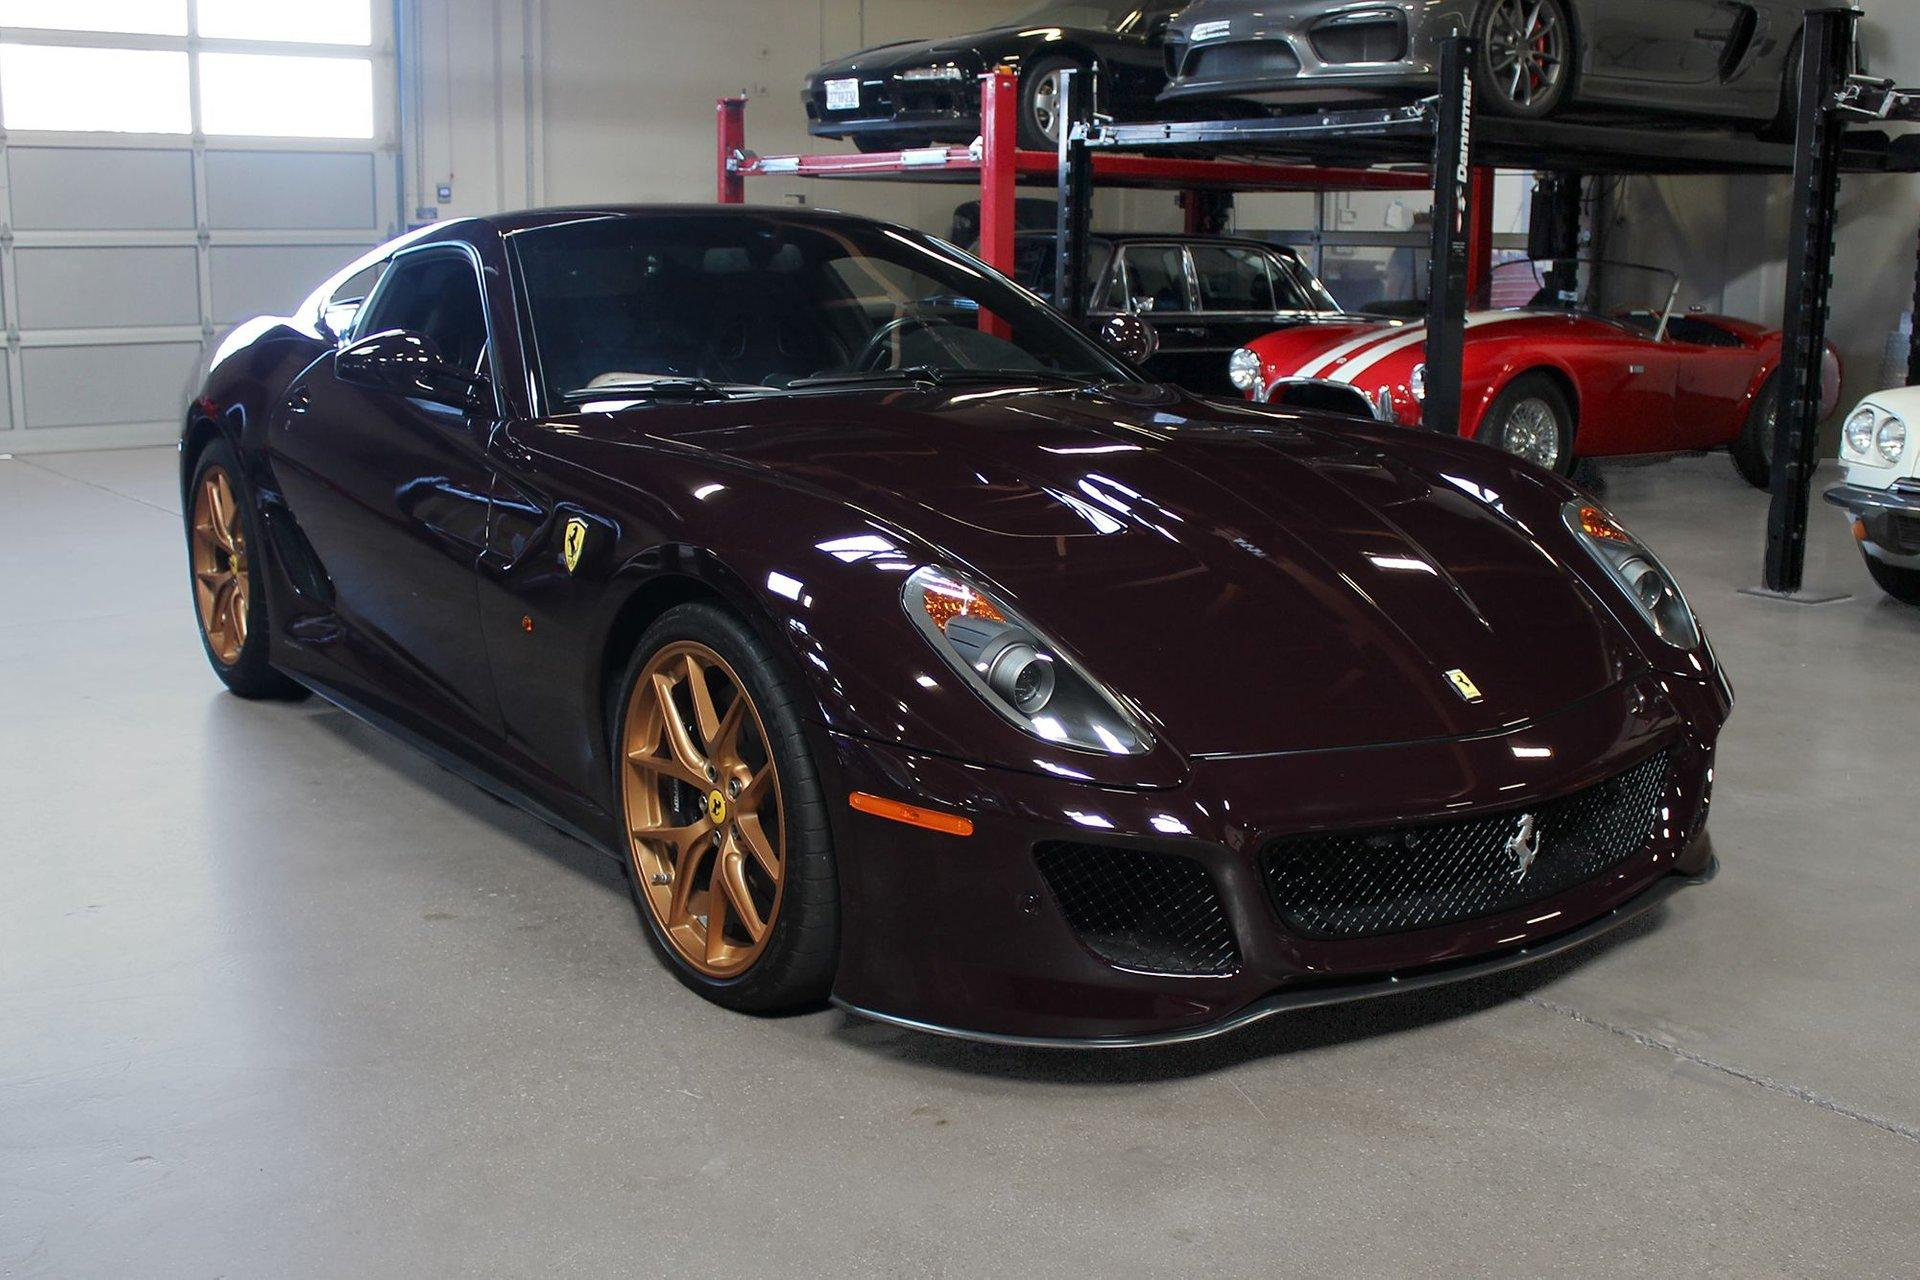 Used 2011 Ferrari 599 GTO for sale $575,000 at San Francisco Sports Cars in San Carlos CA 94070 1